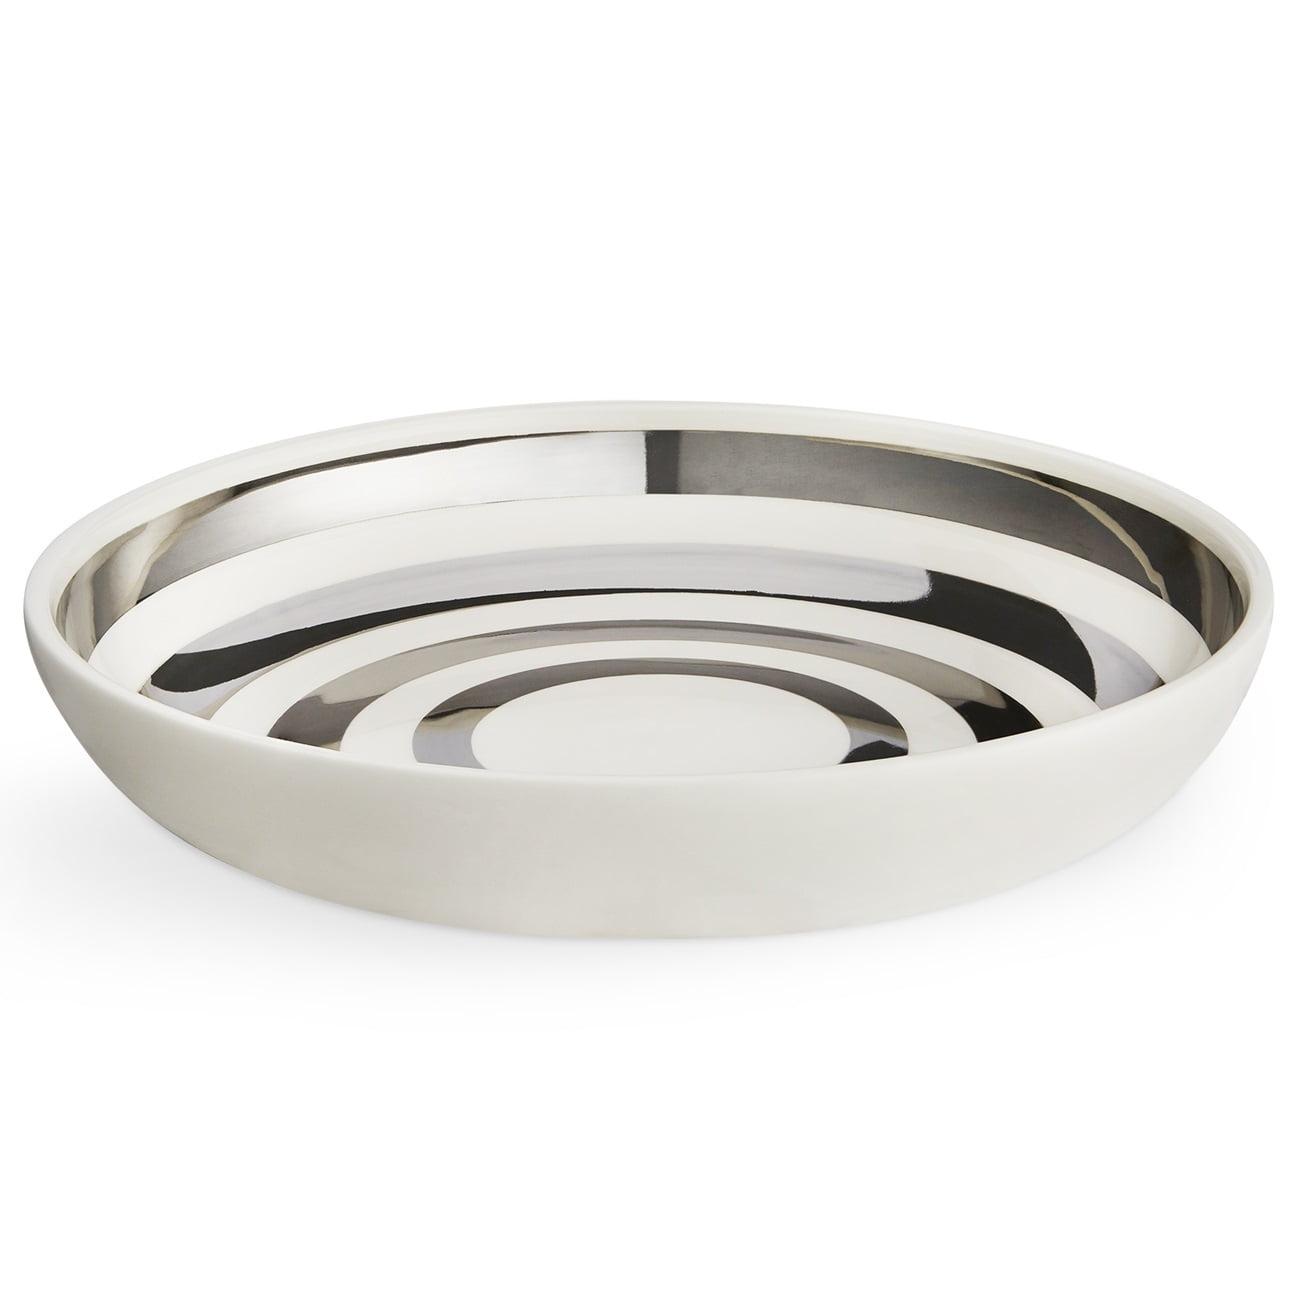 KÄHLER Keramická mísa Omaggio Silver - limitovaná edice, stříbrná barva, krémová barva, keramika